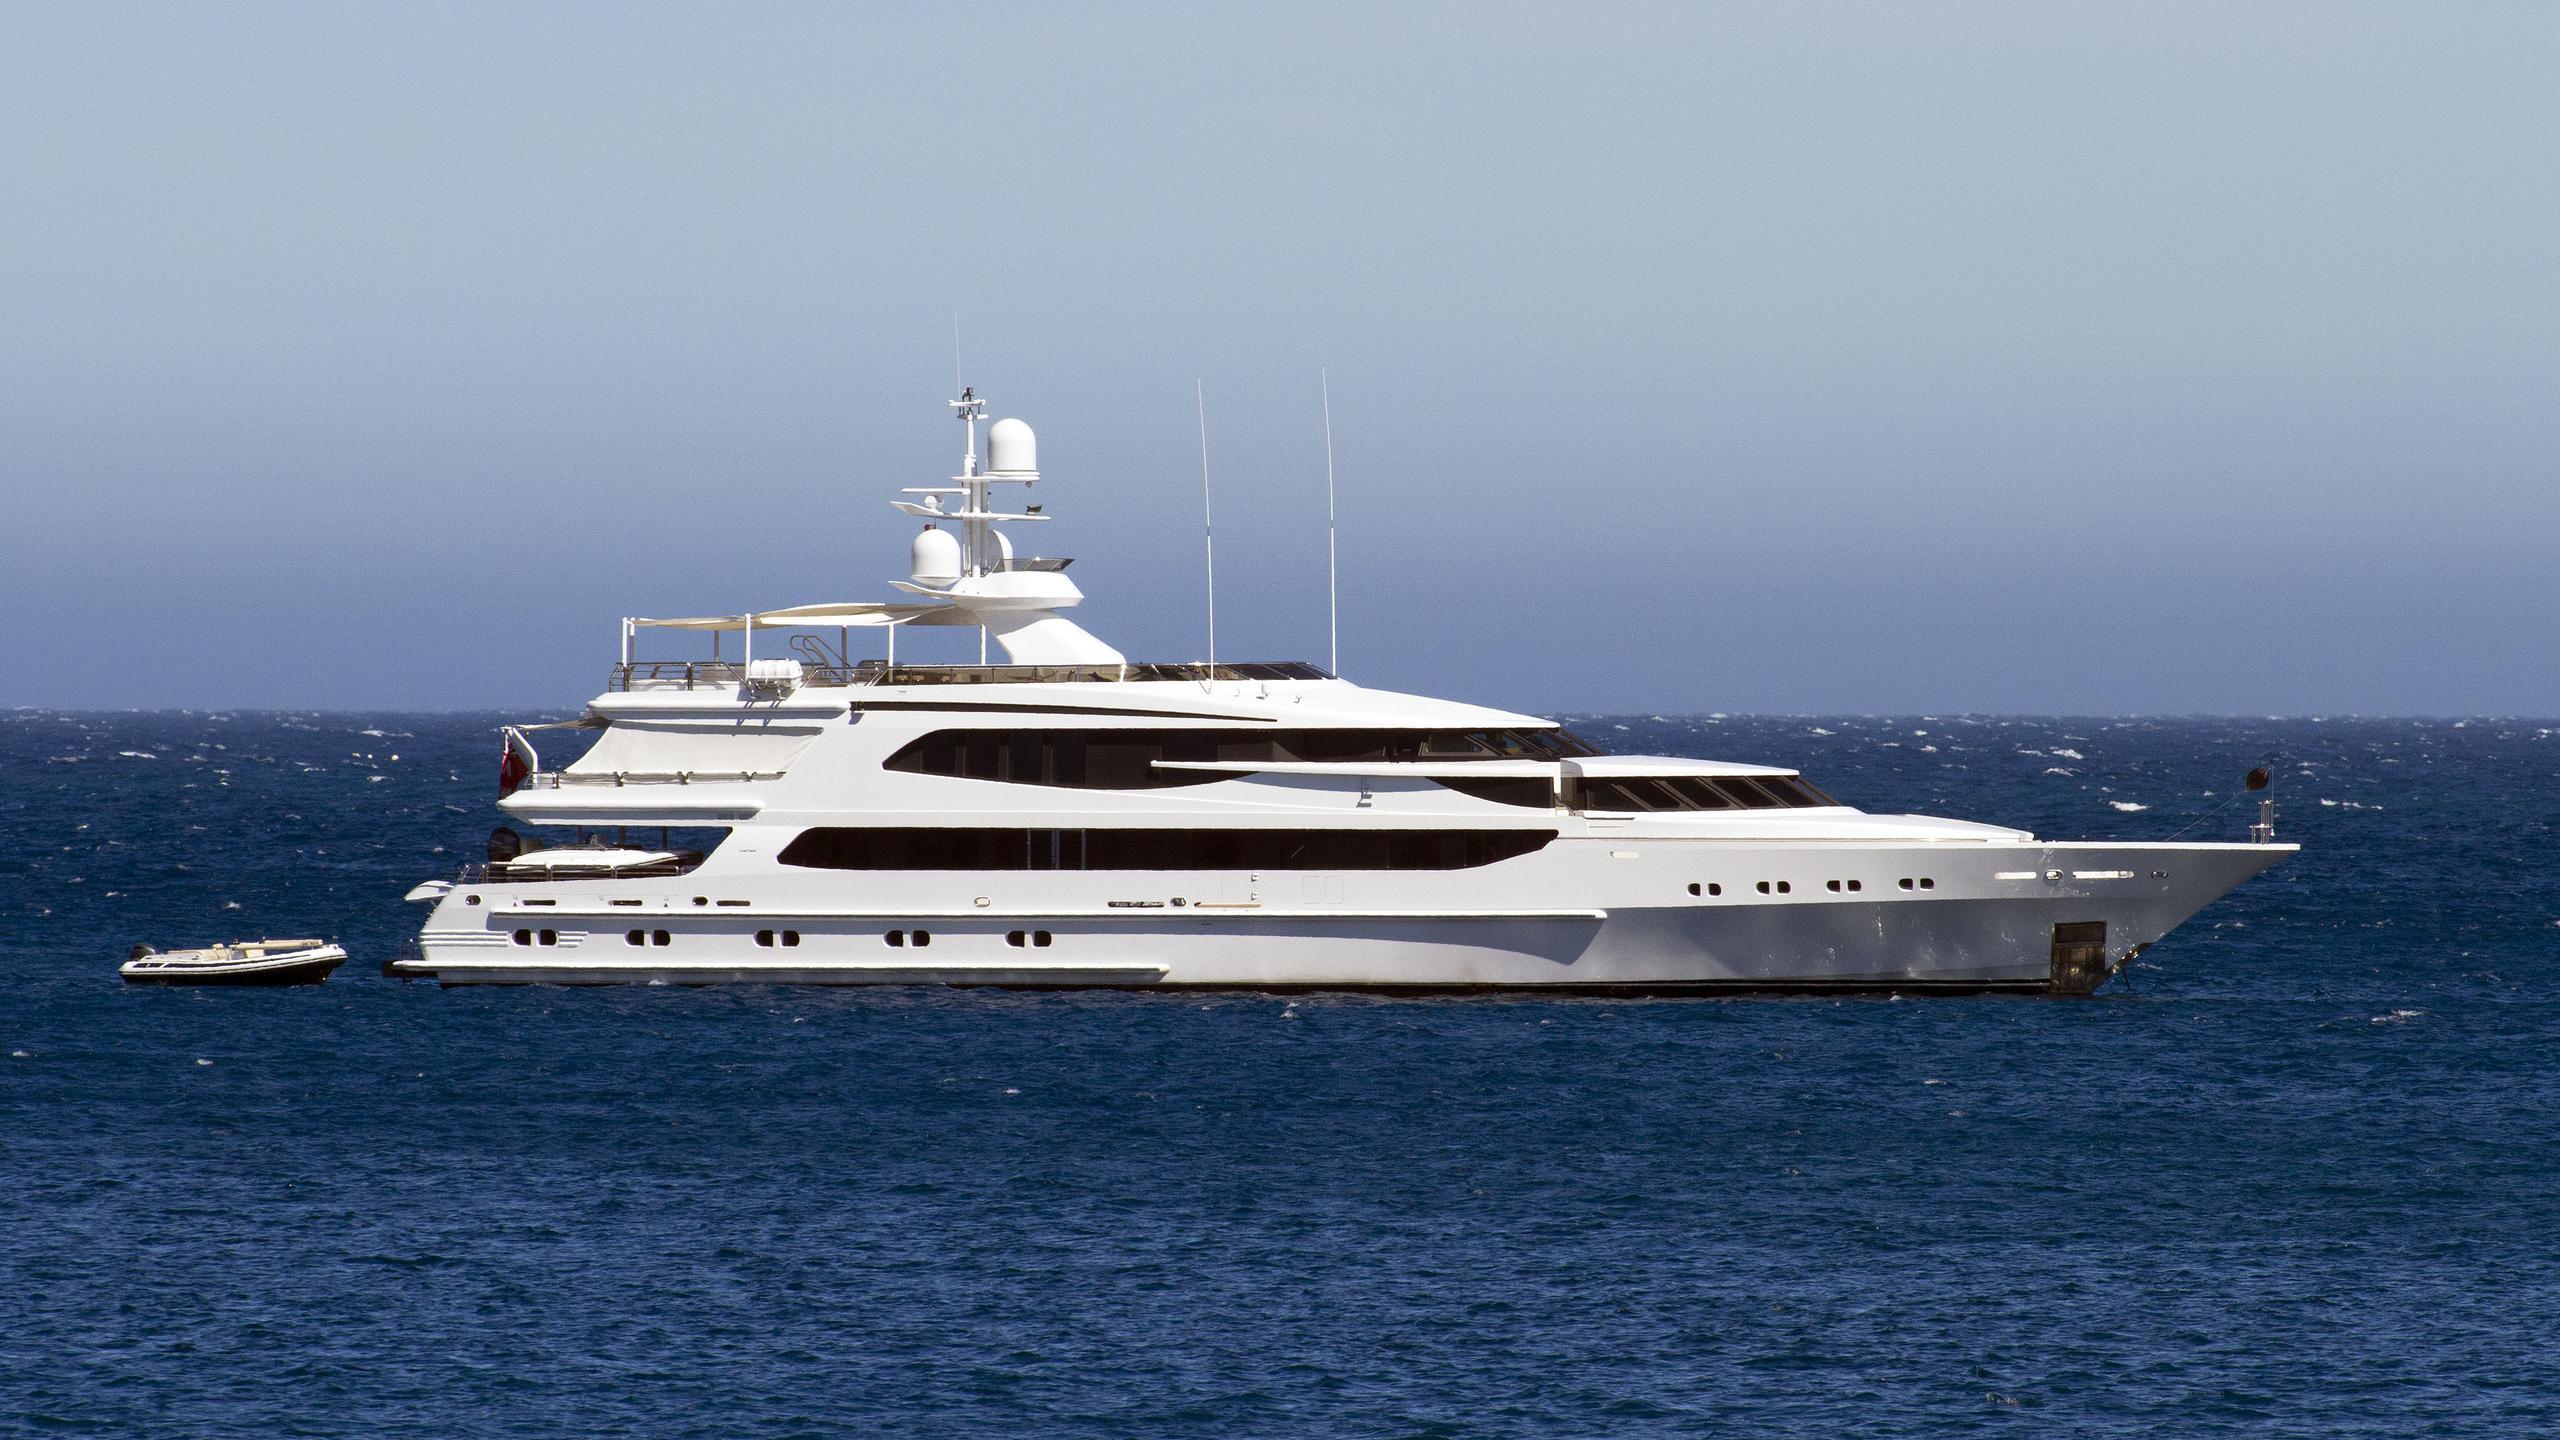 lazy-z-motor-yacht-oceanco-1997-51m-profile